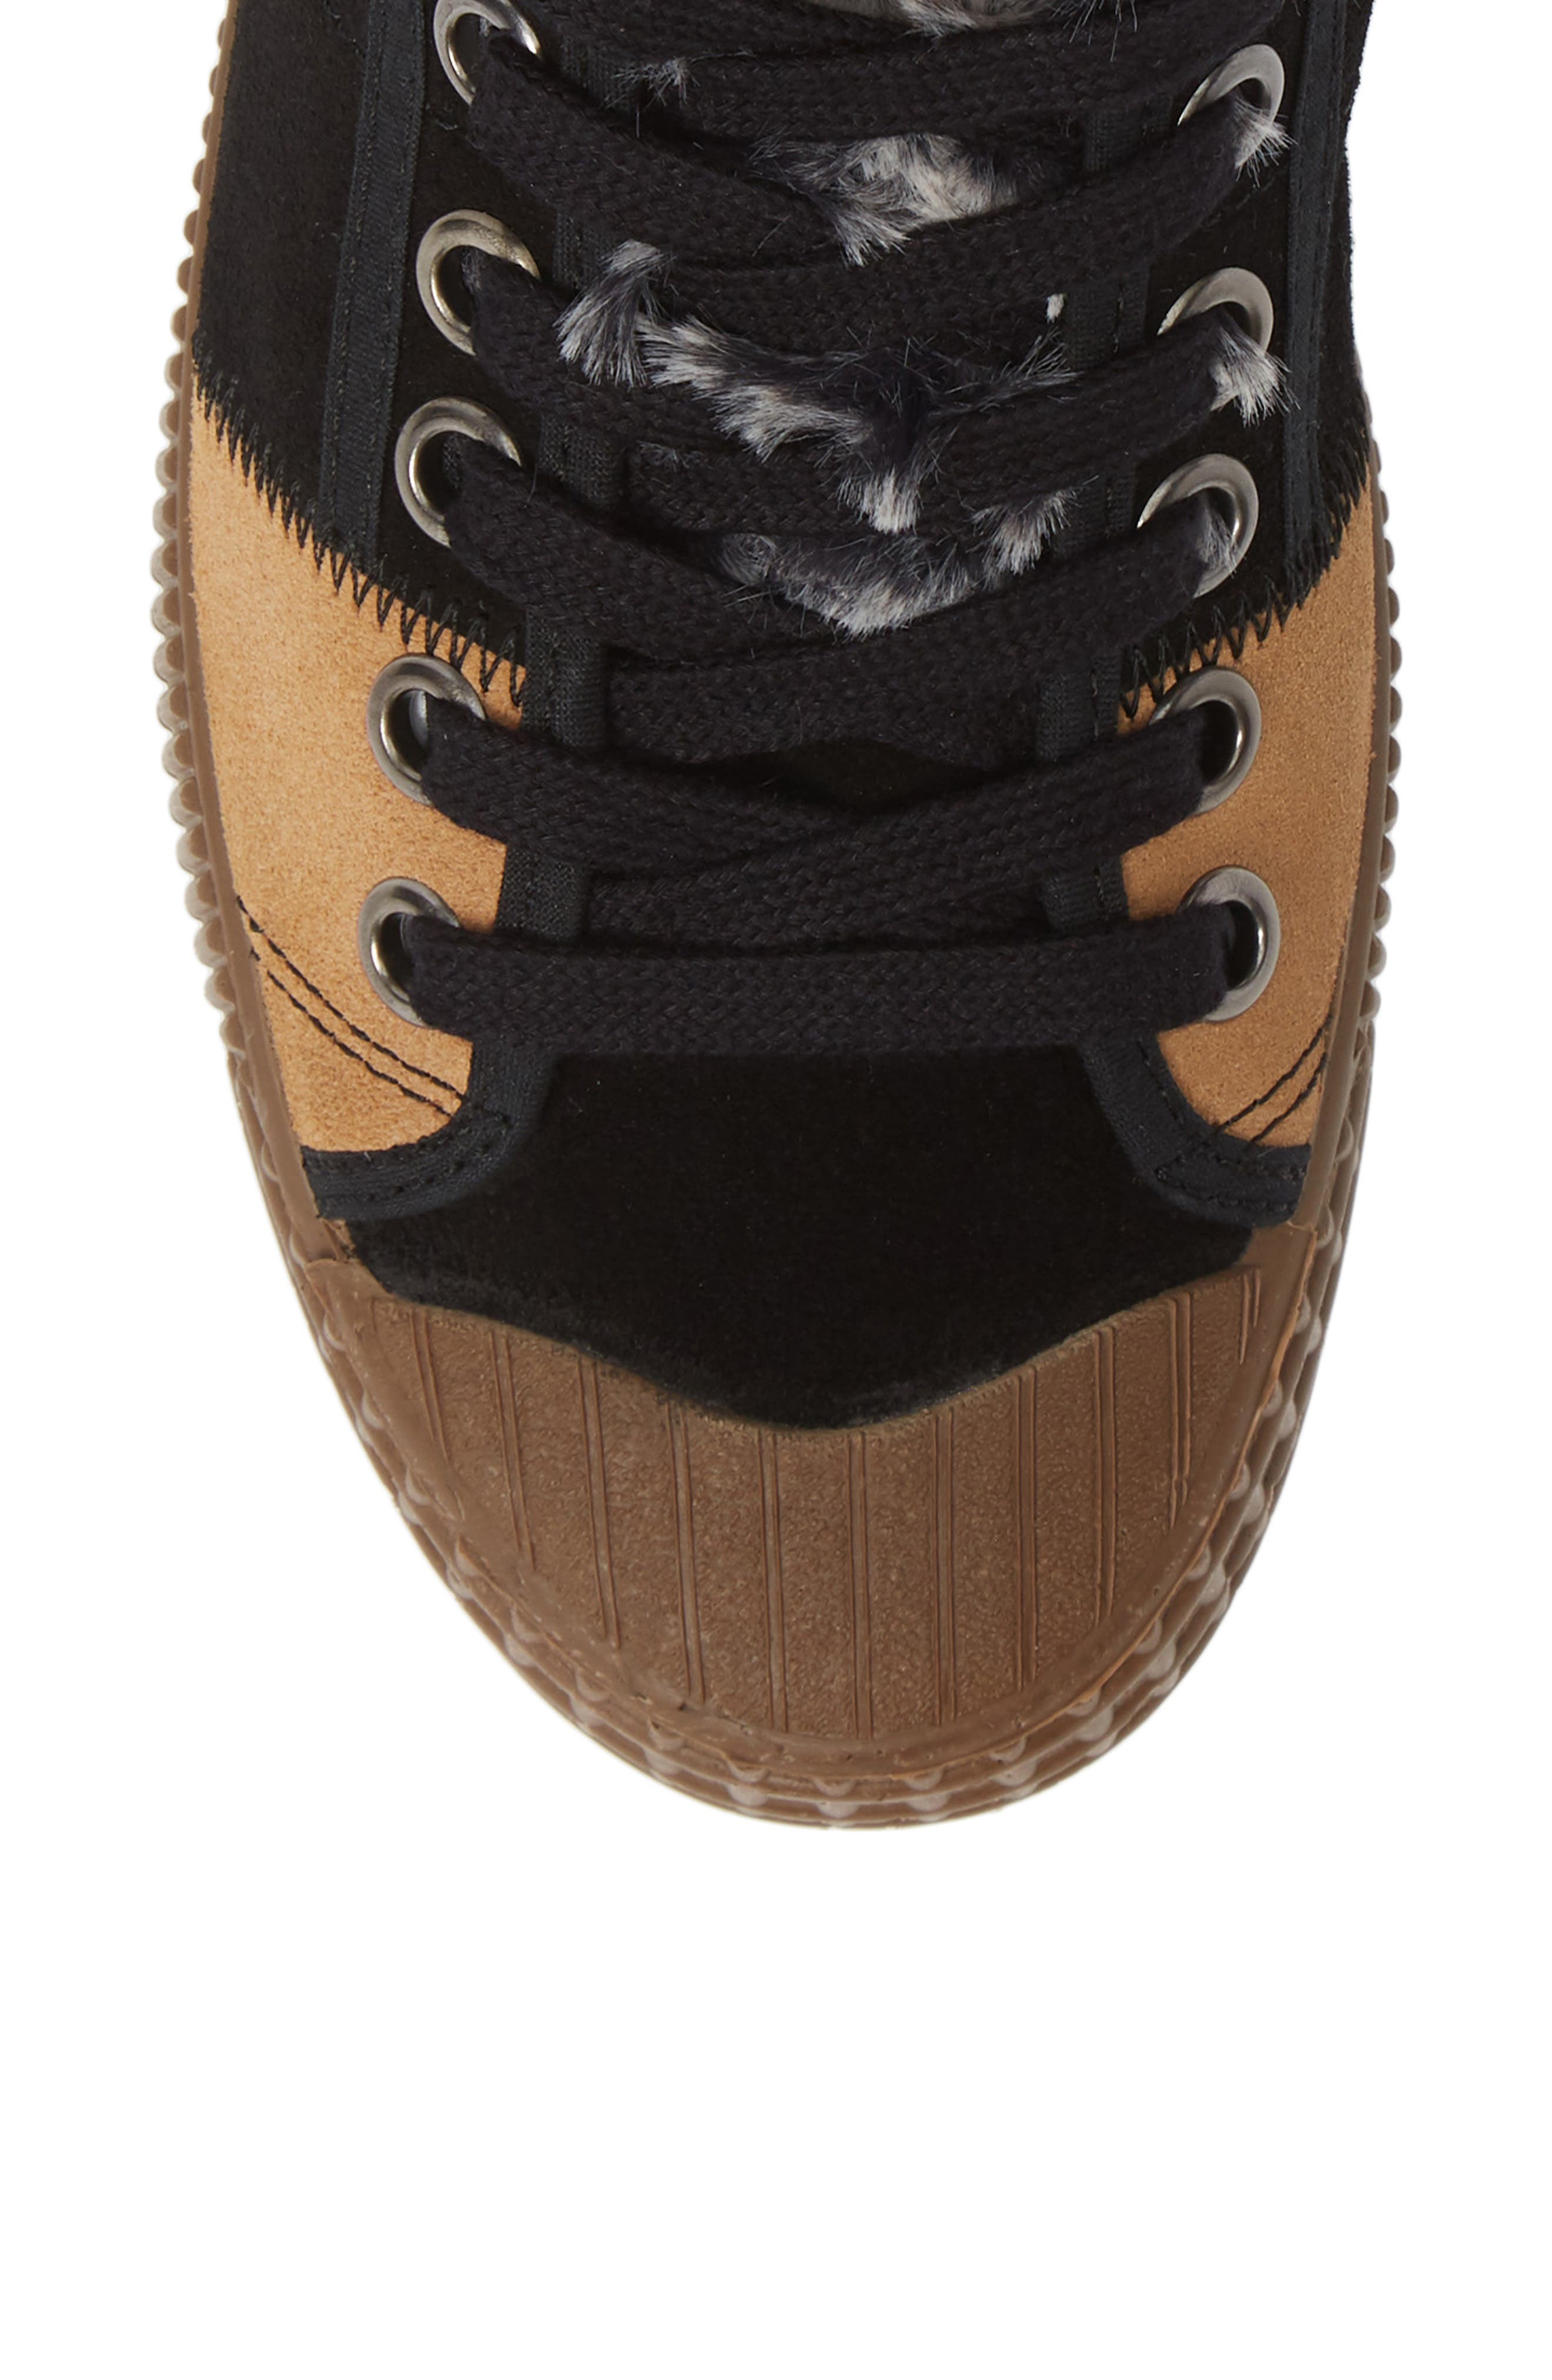 Femp High Top Sneaker,                             Alternate thumbnail 5, color,                             BLACK/ CAMEL SUEDE